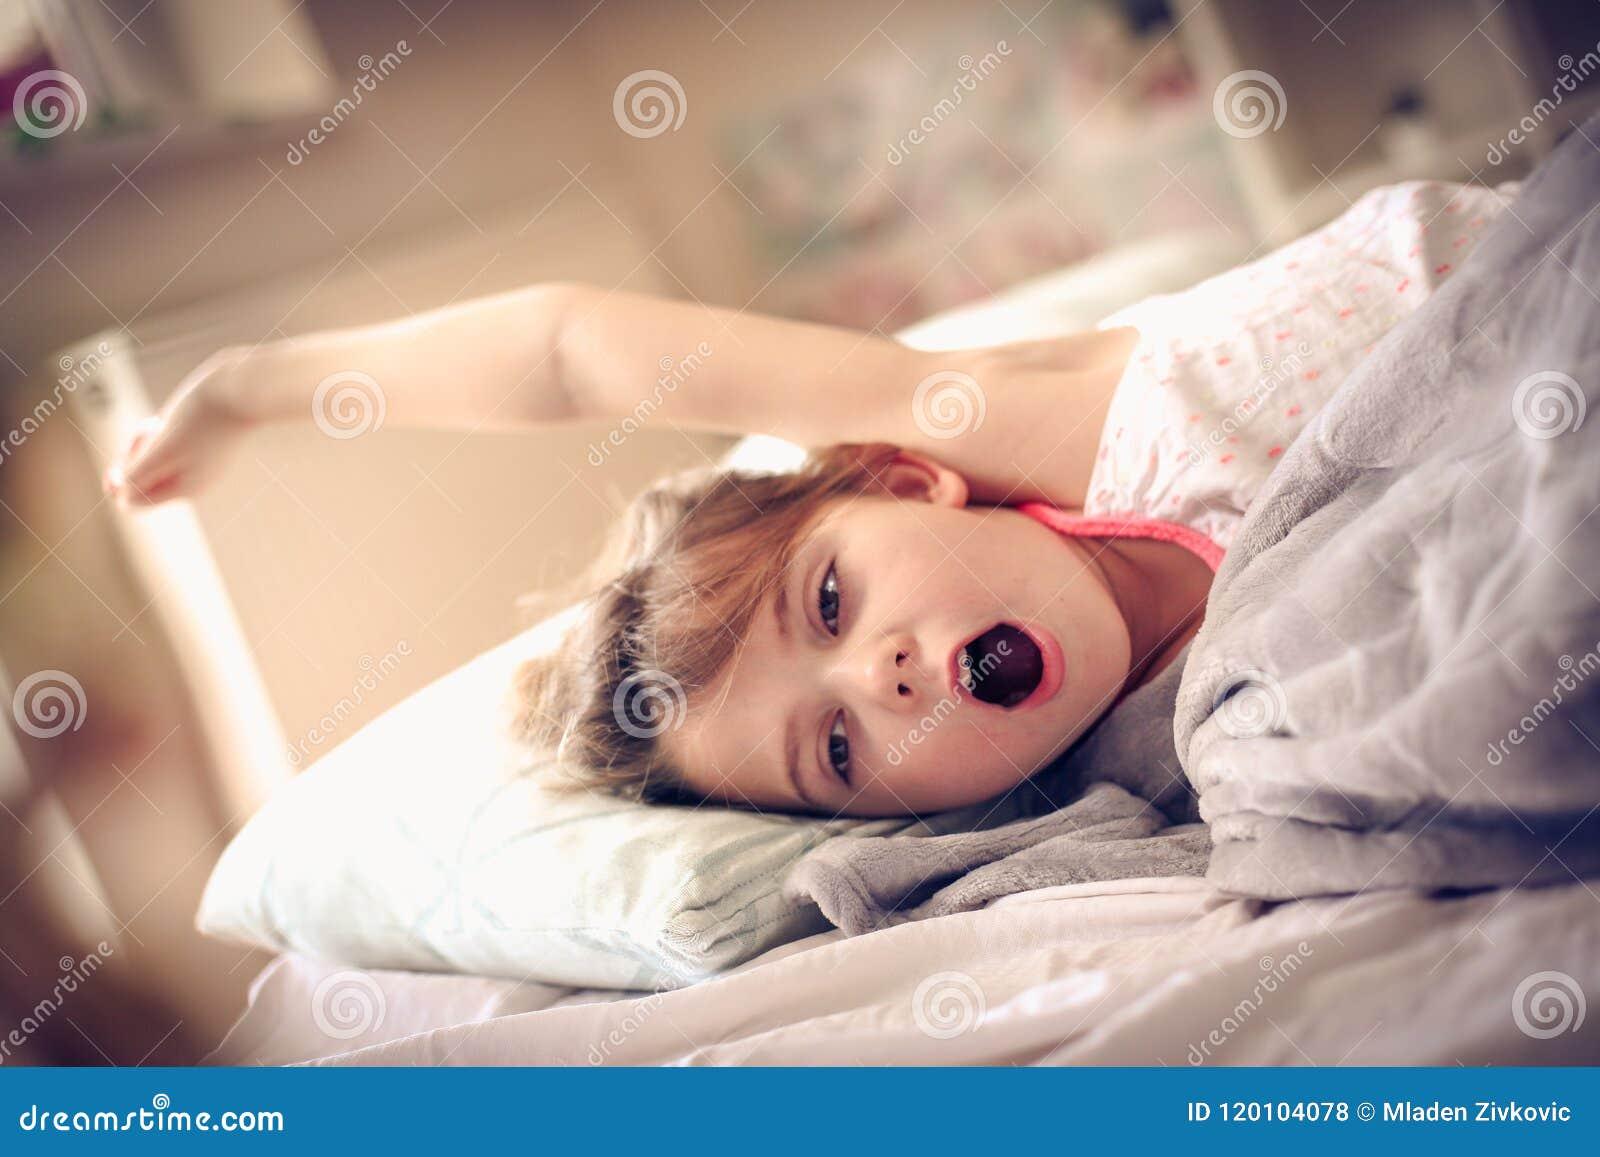 Awaking. Kid in bed.